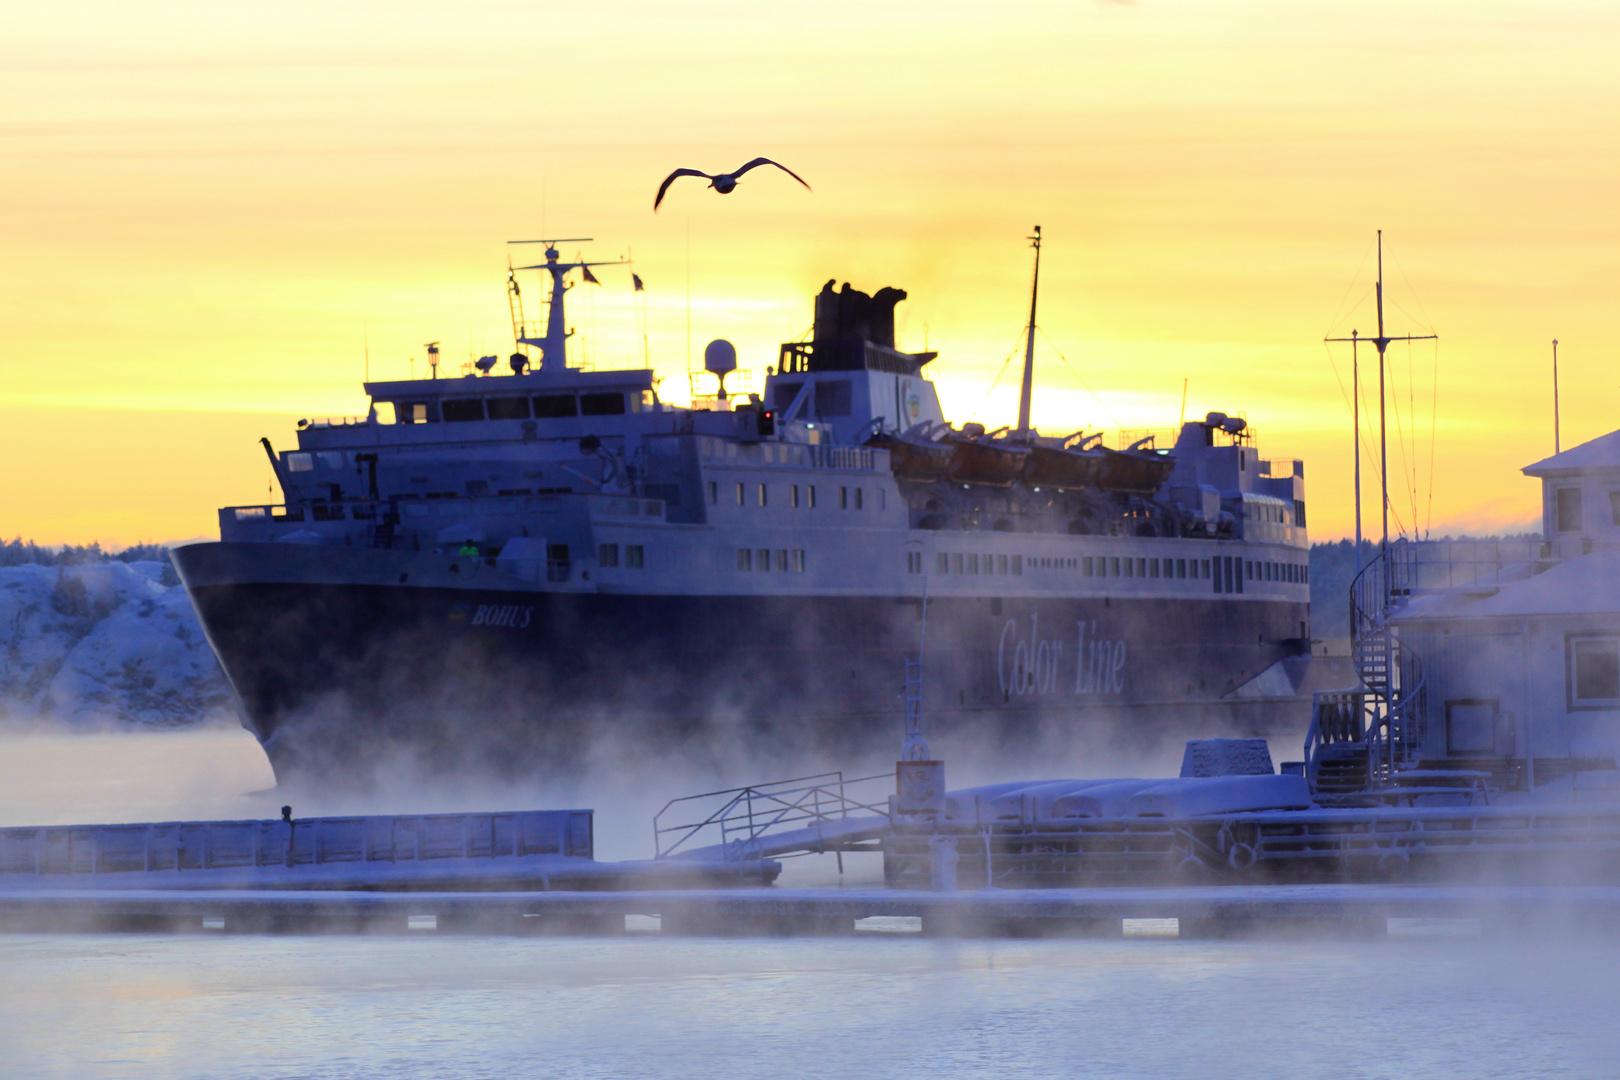 Ferry on ice